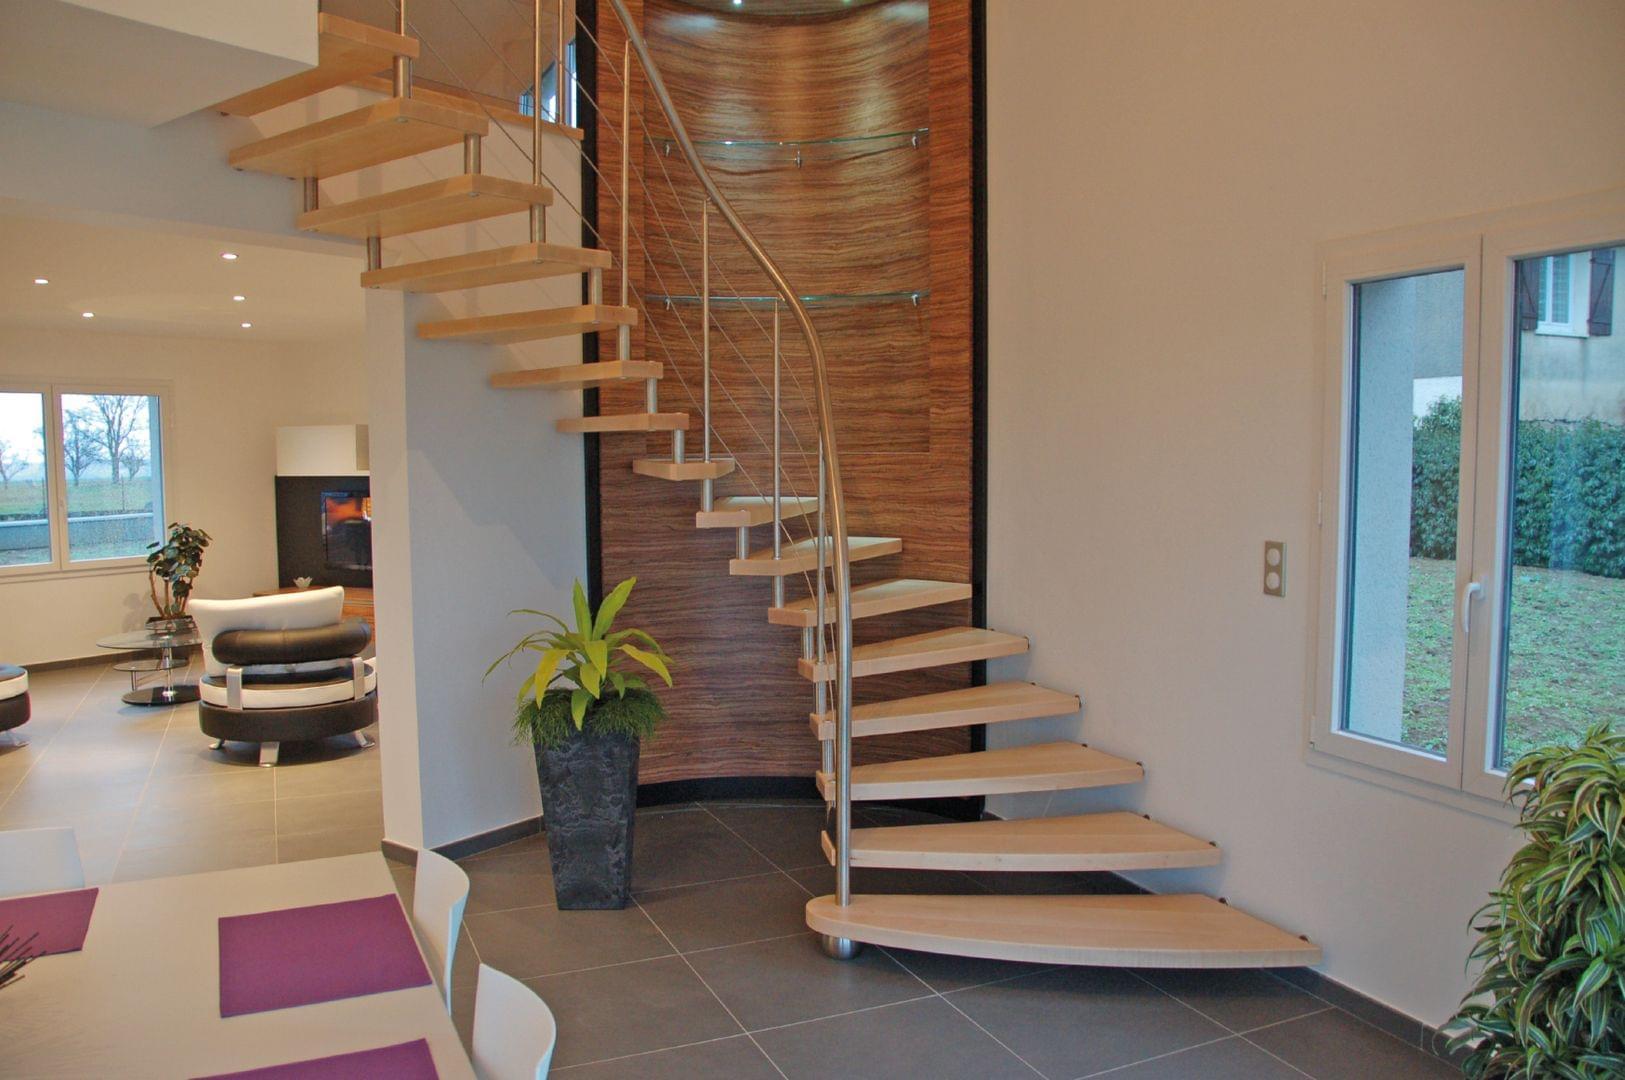 Escalier moderne modèle Epura de Treppenmeister TREPPENMEISTER